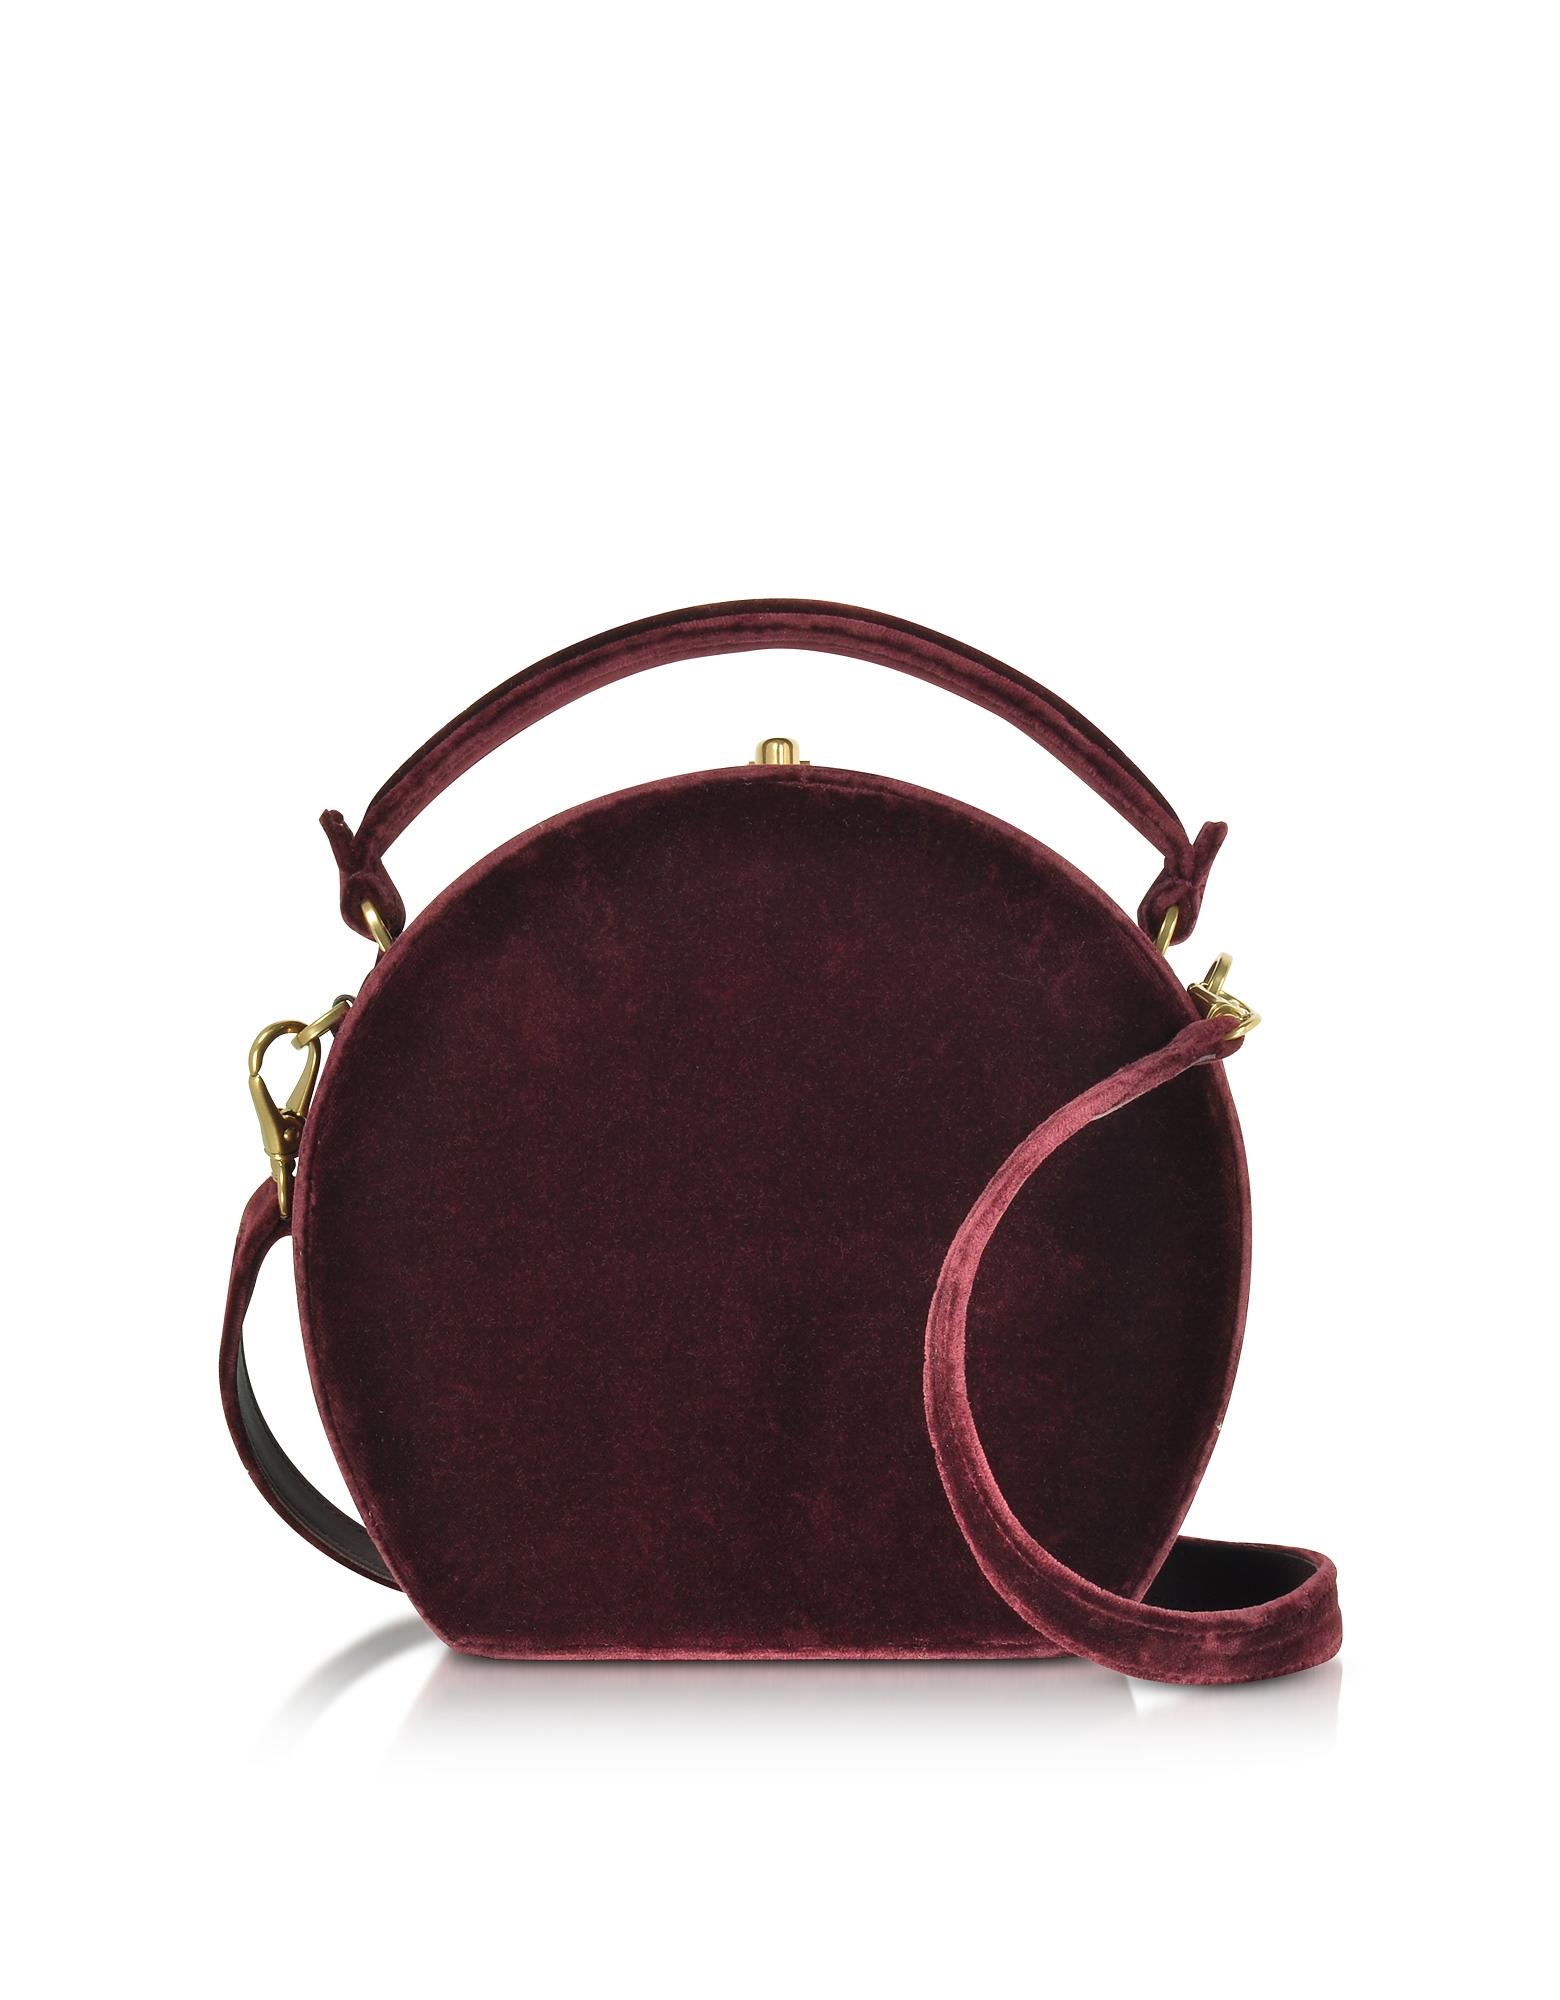 Burgundy Velvet Bertoncina Satchel Bag